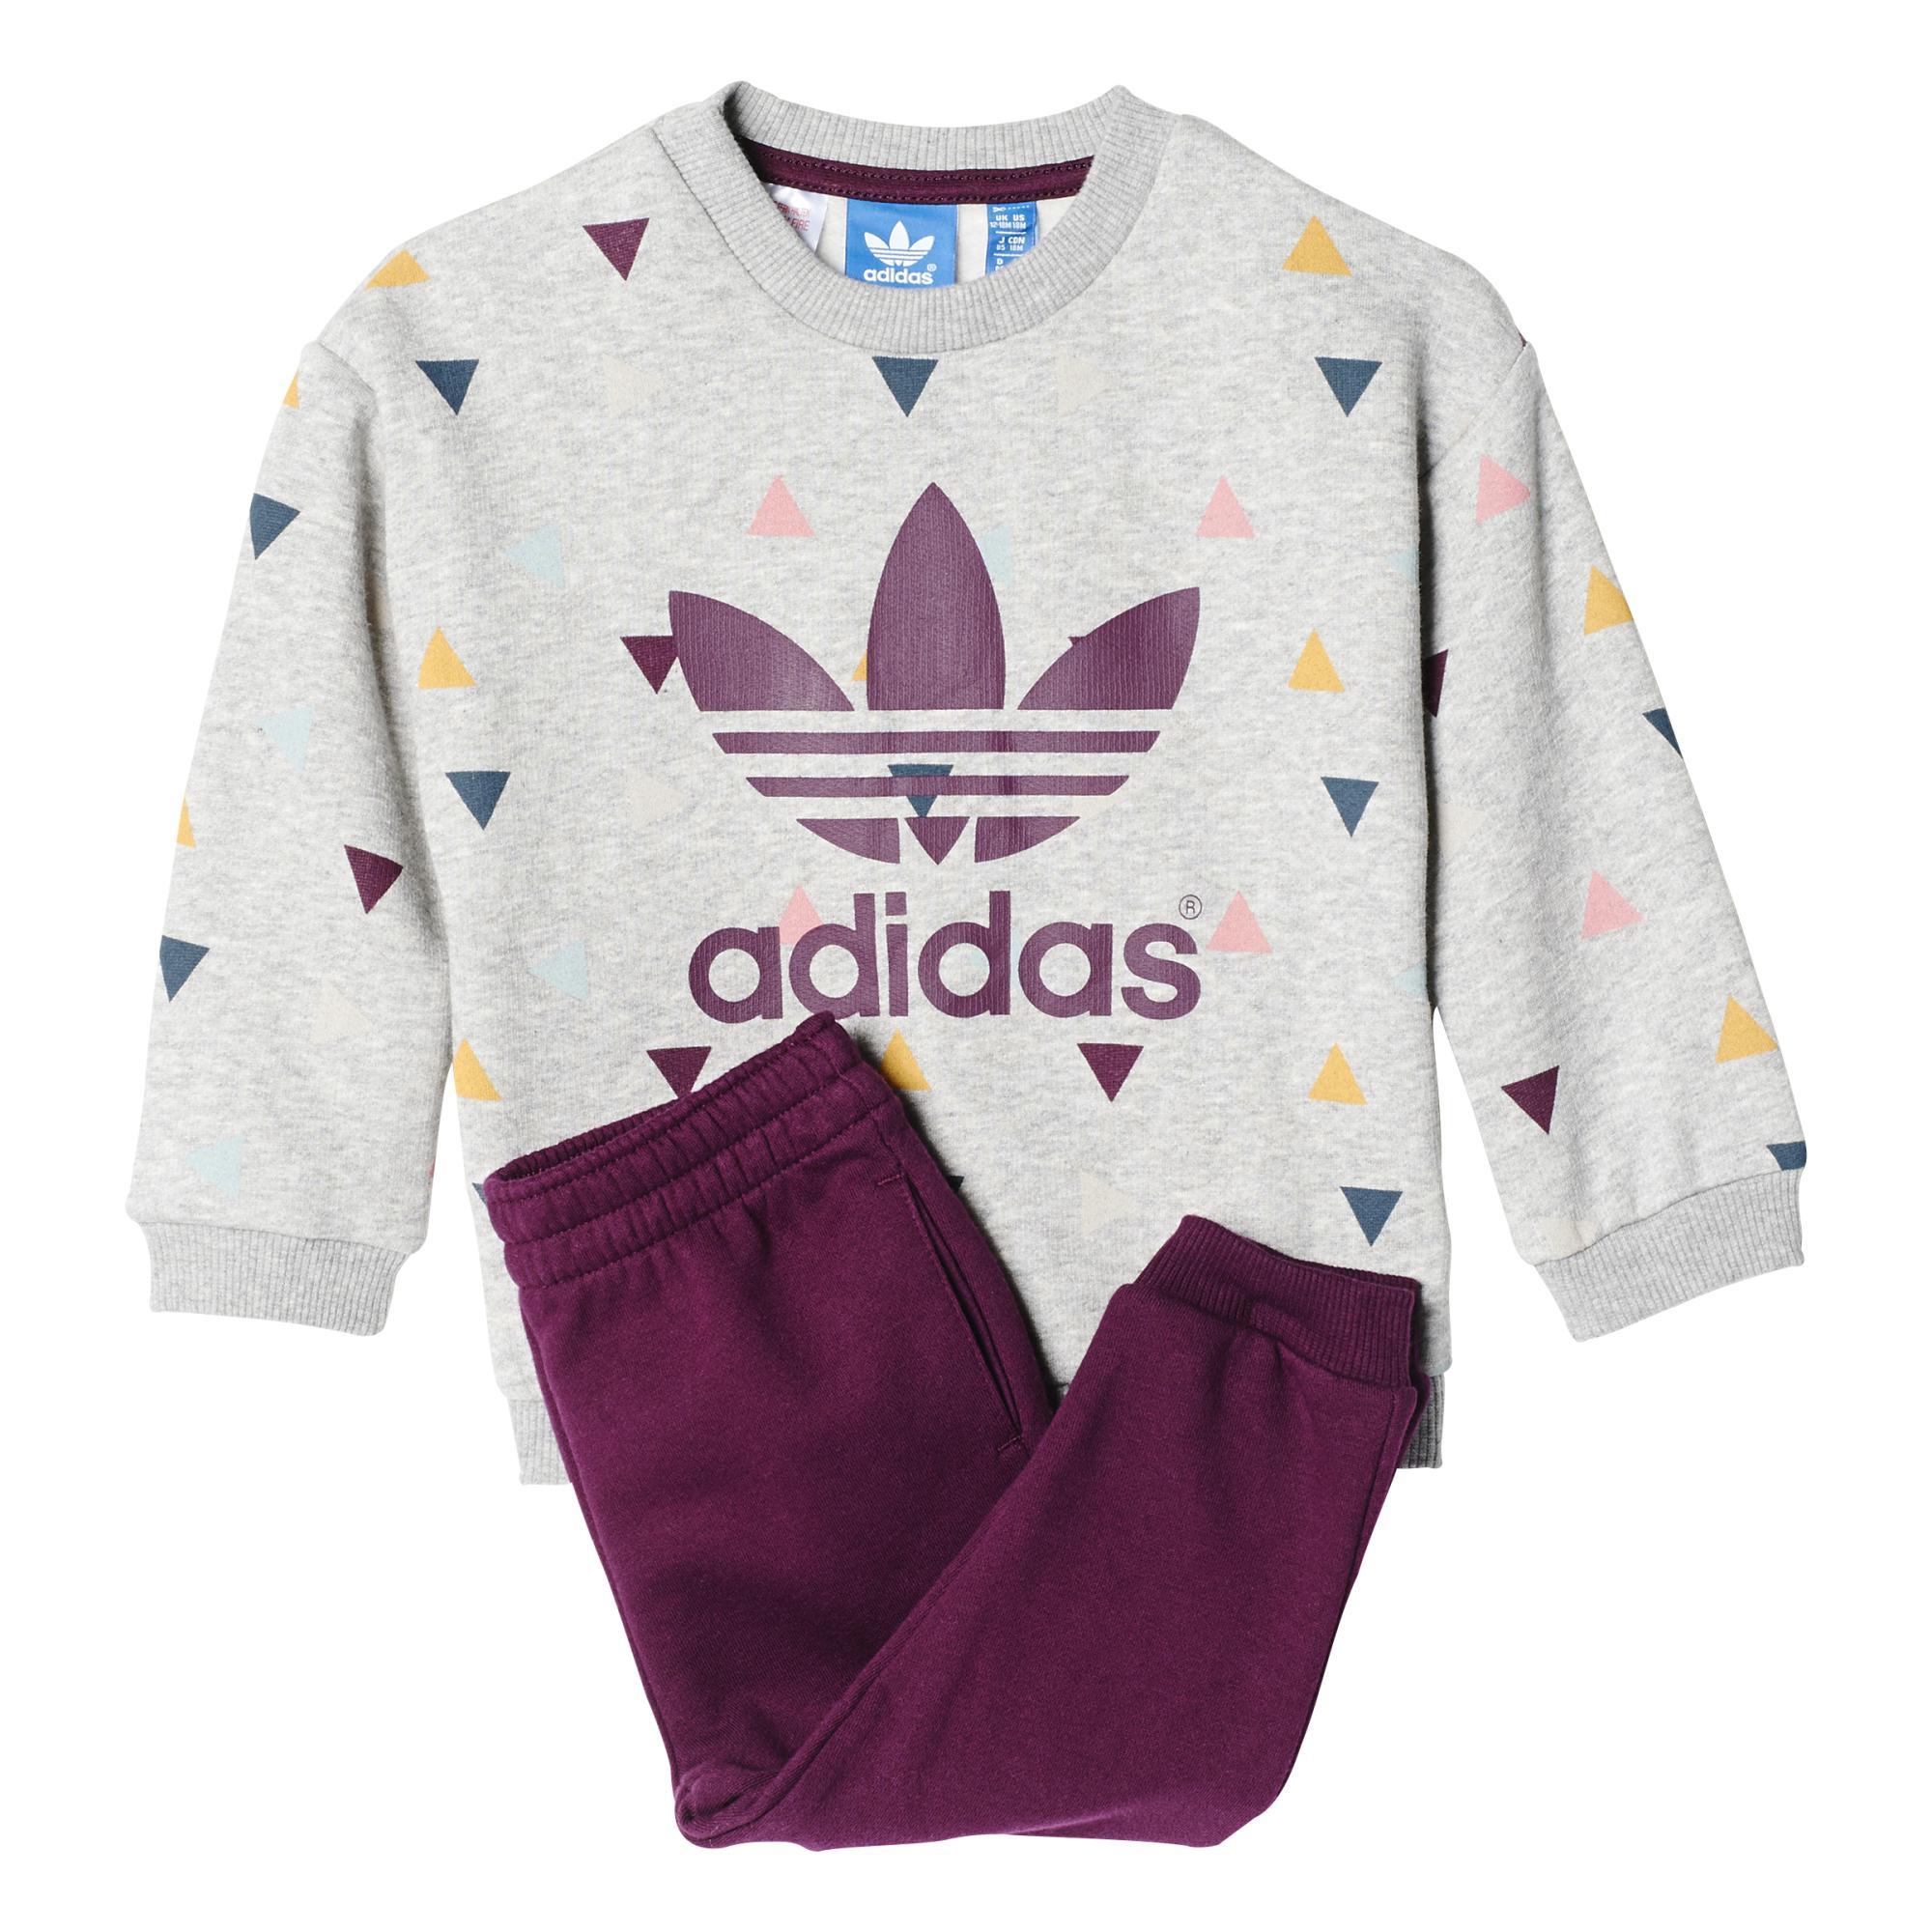 Adidas Adventure Winter Infants Originlas Chándal grisr Fleece FrUFBq